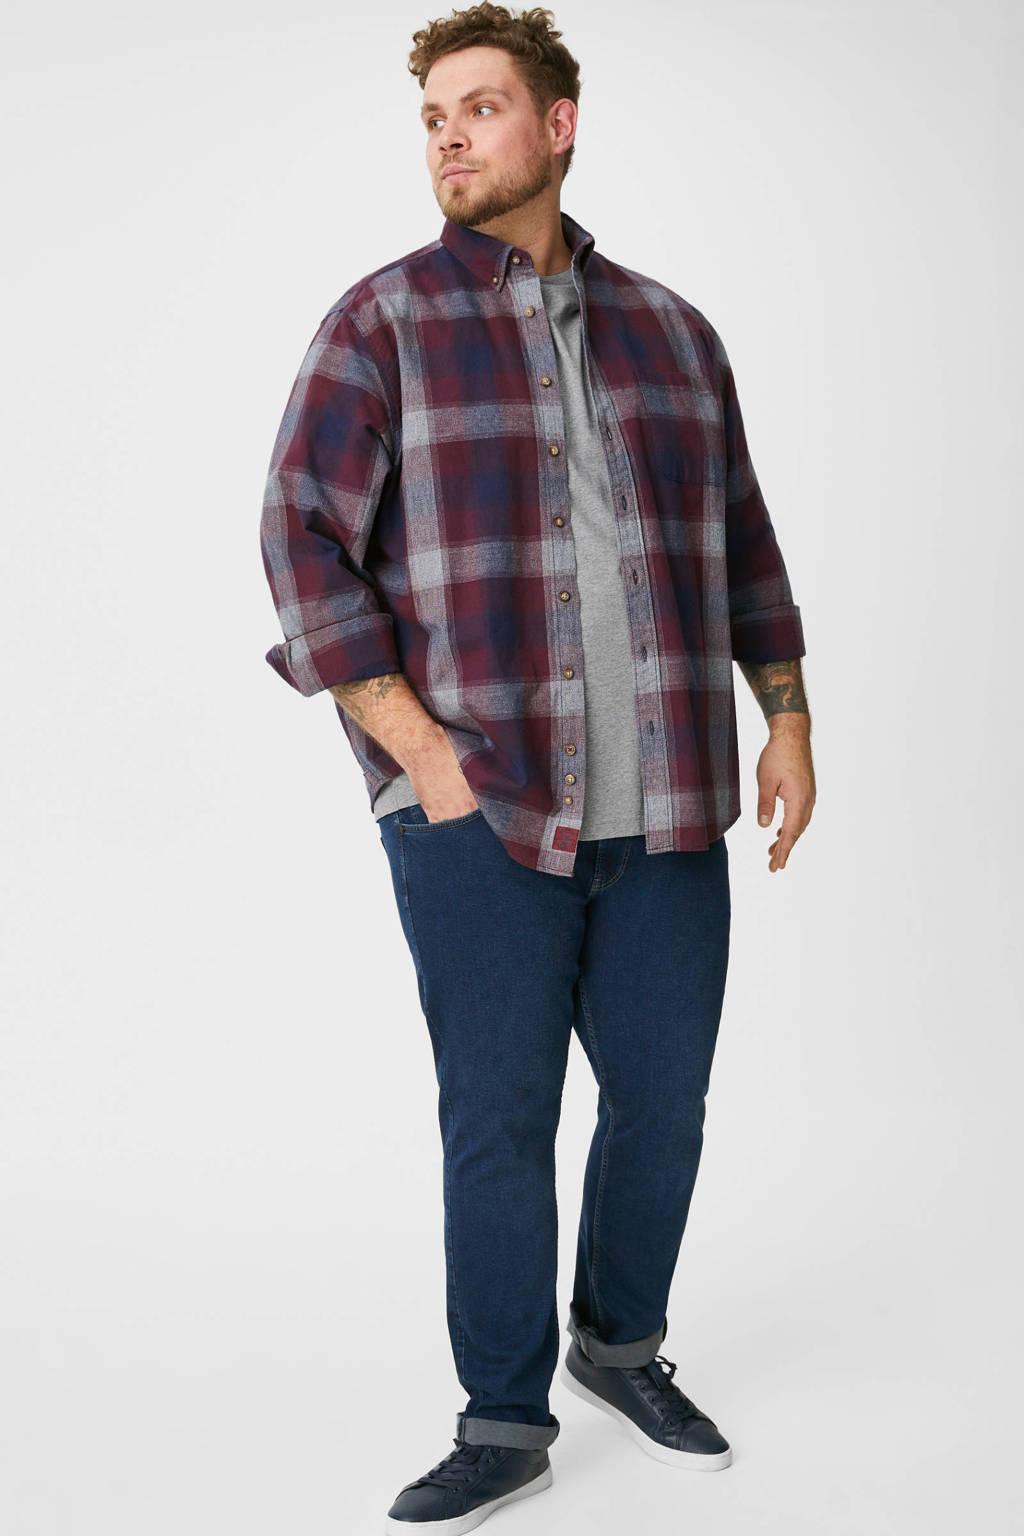 C&A XL T-shirt met printopdruk grijs, Grijs